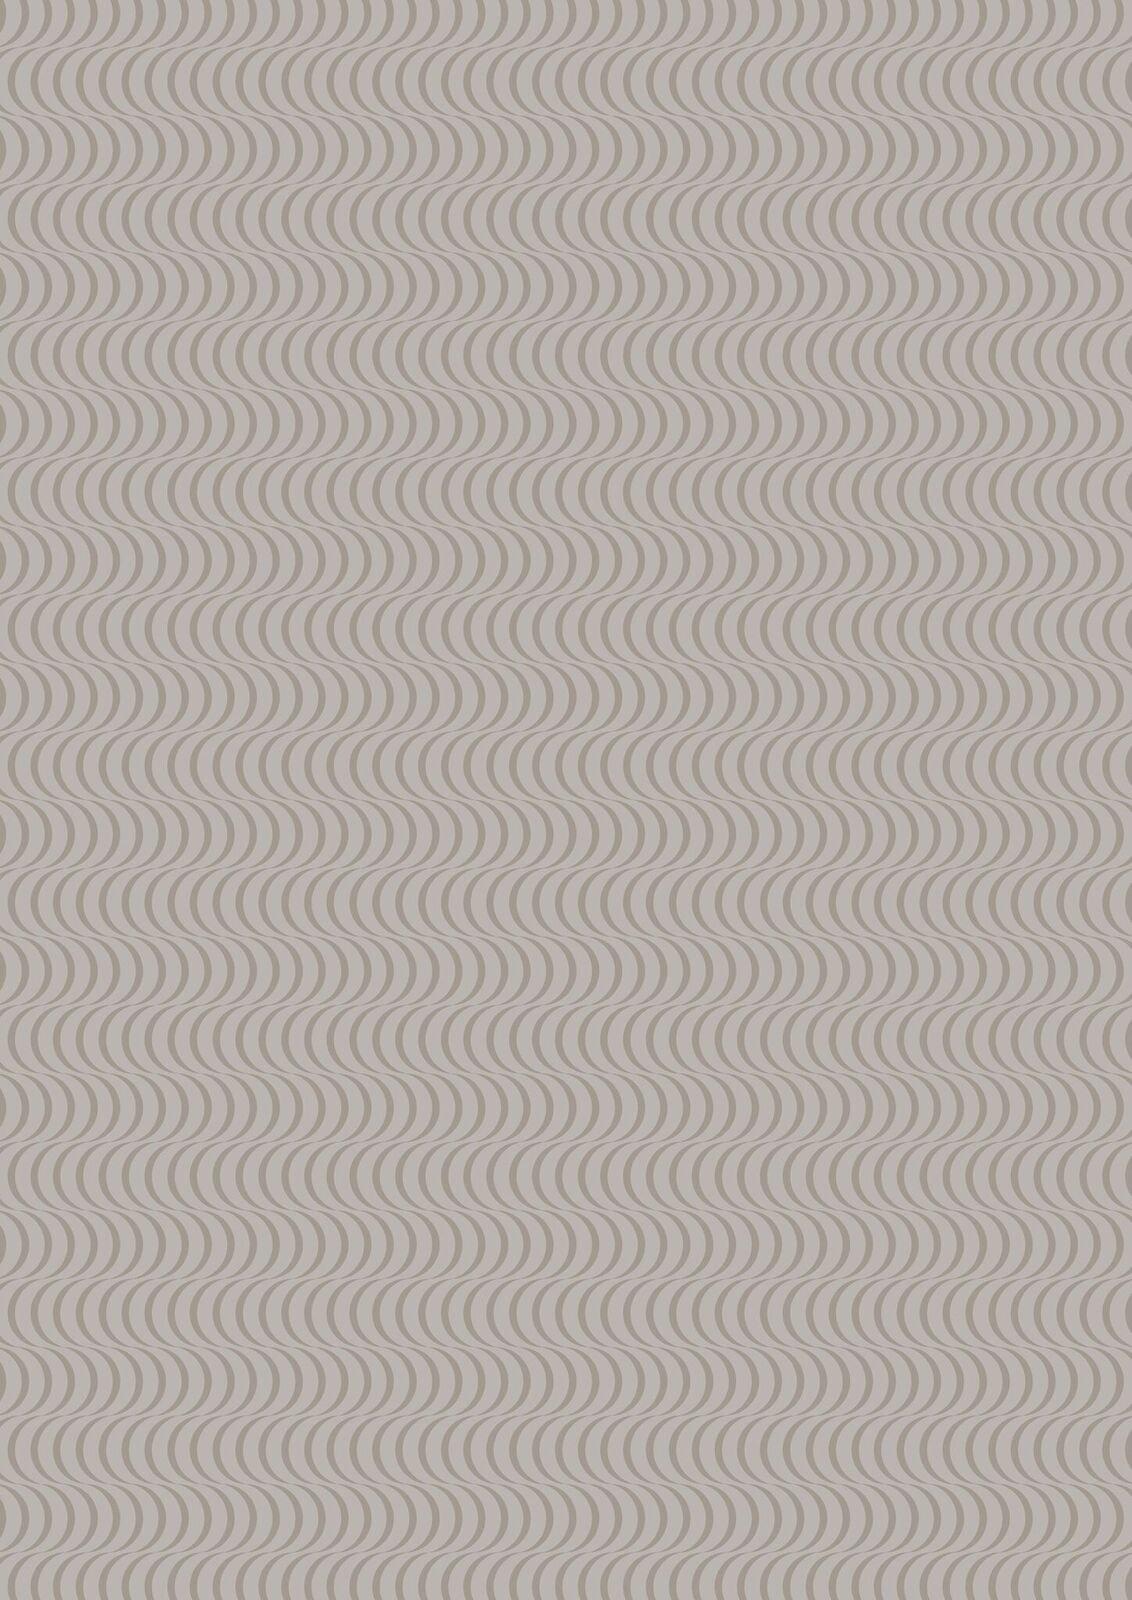 Lewis & Irene Geometrix - Gray with Scallops - GX3.3